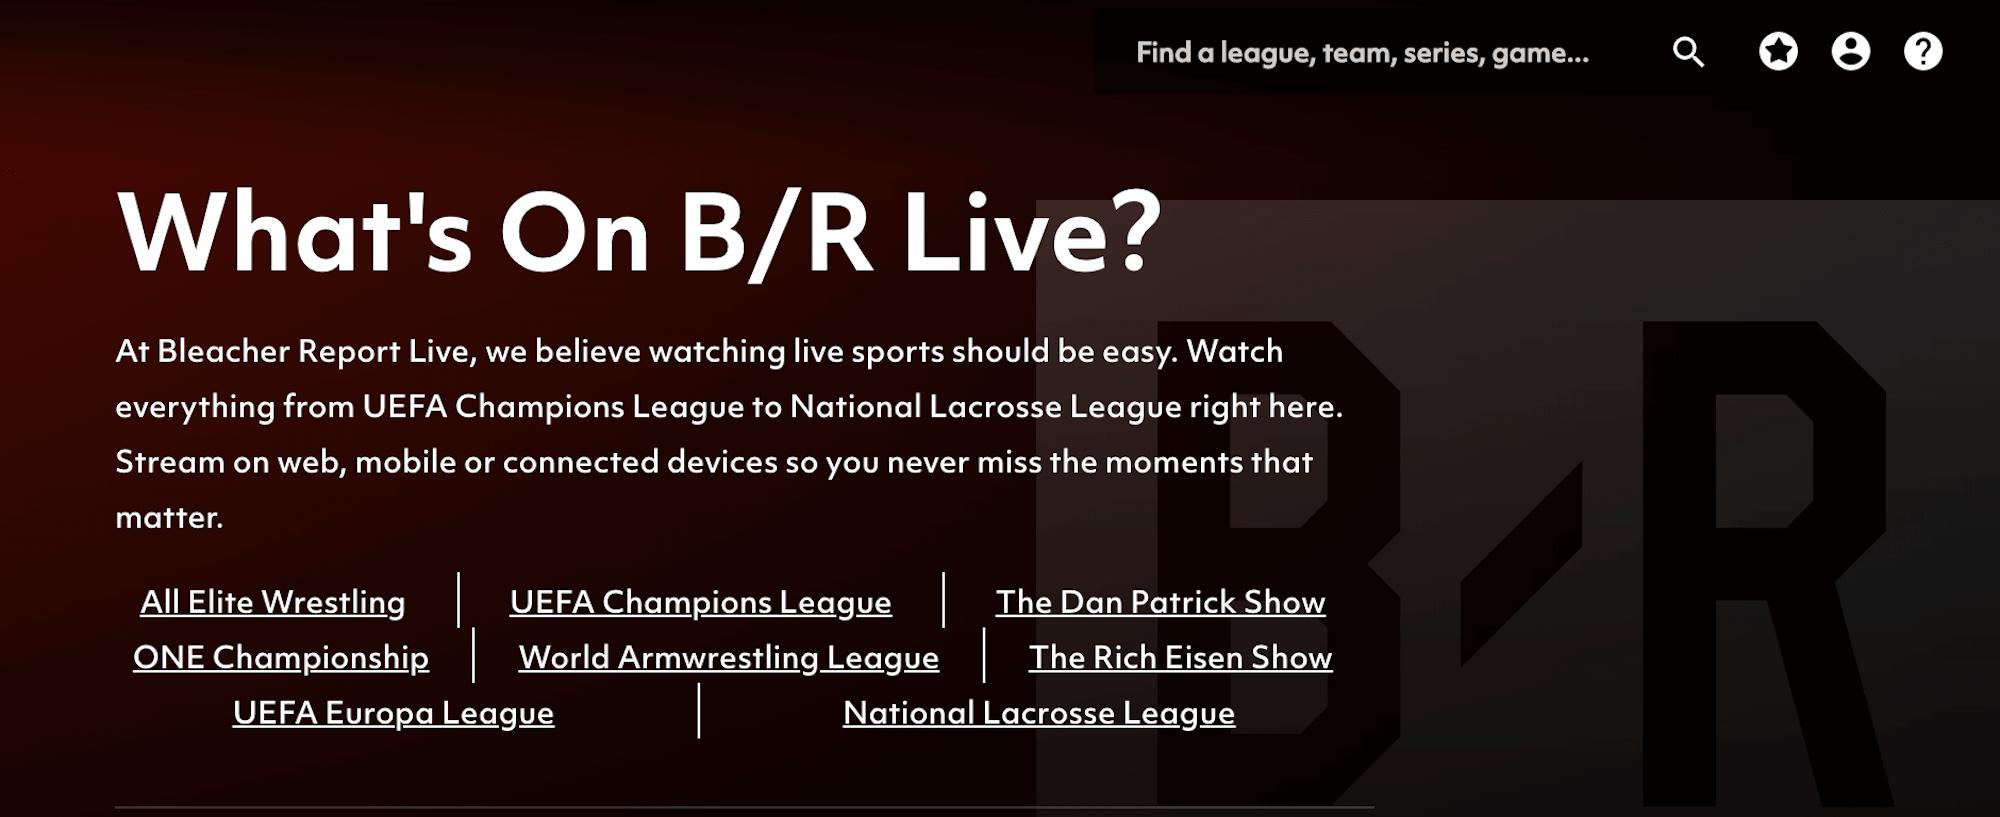 watch Real Madrid vs psg live stream on B/R Live